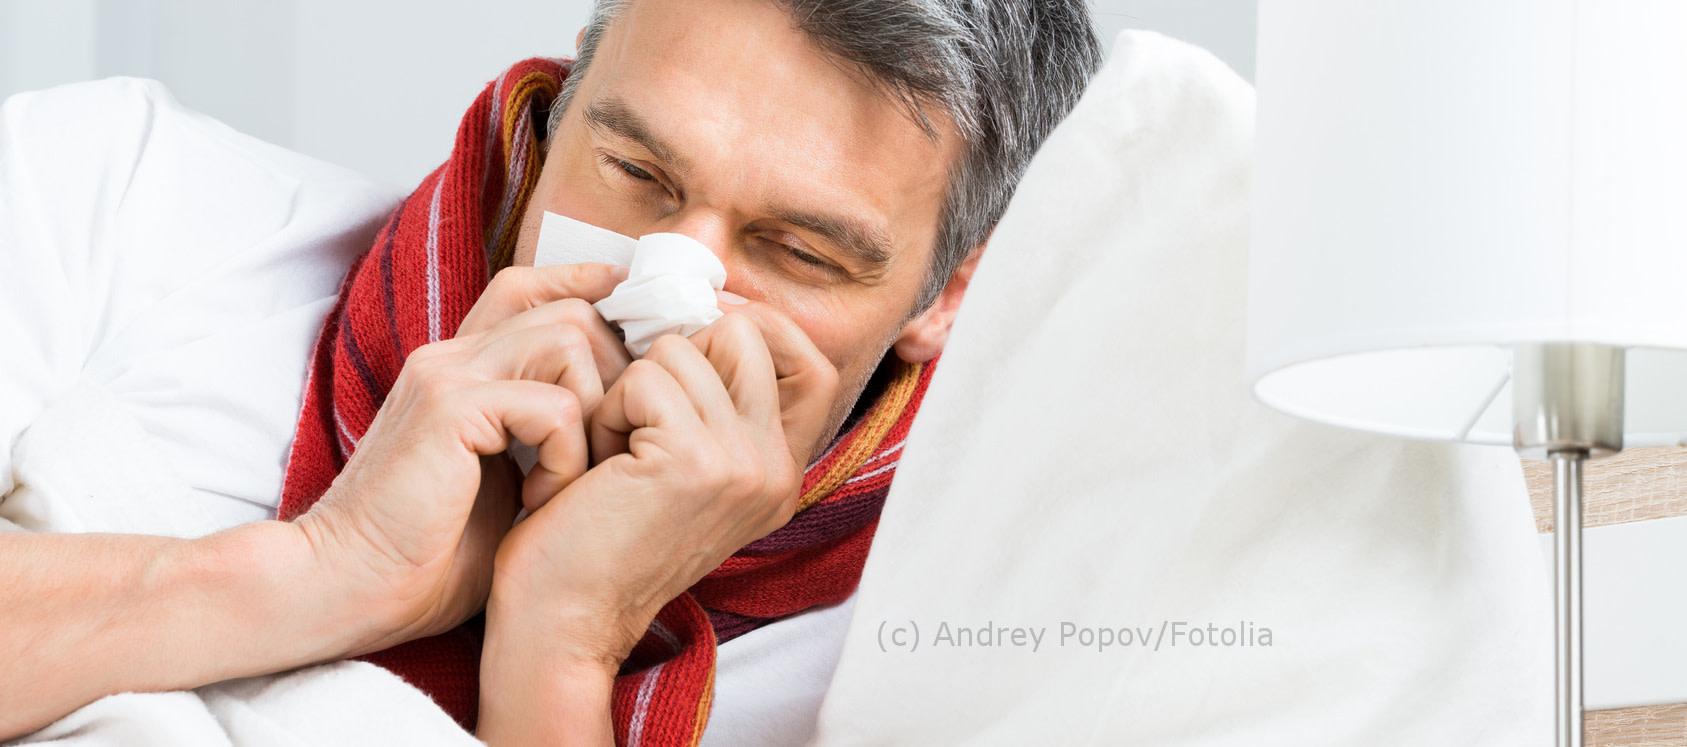 Grippe vs erk ltung  c  andrey popov fotolia kleinerxvjg4o